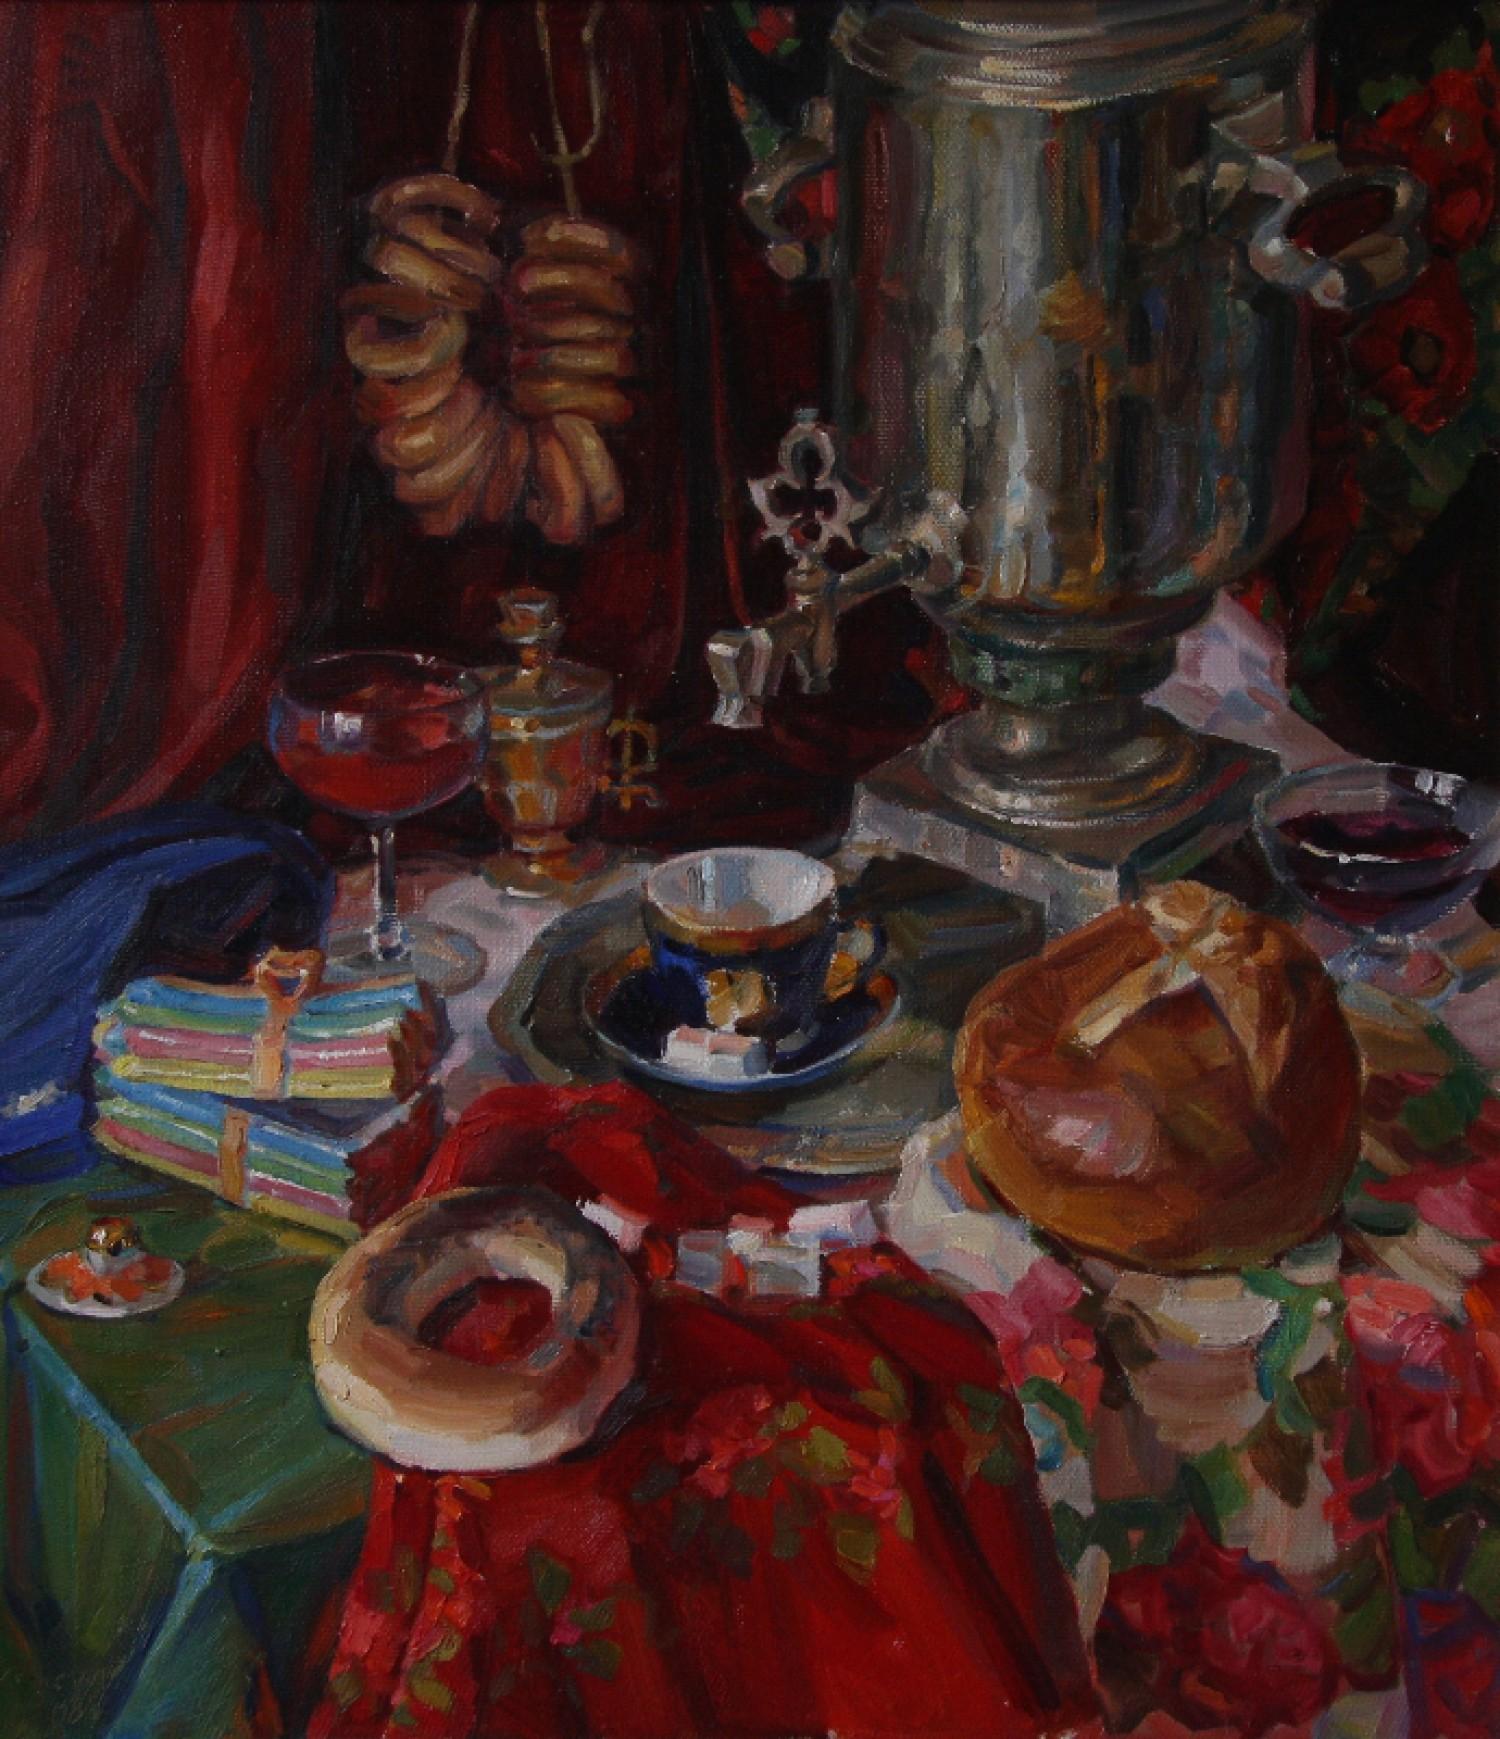 Ю.В.Урсул. Русский самовар. Холст, масло. 95х80 см.